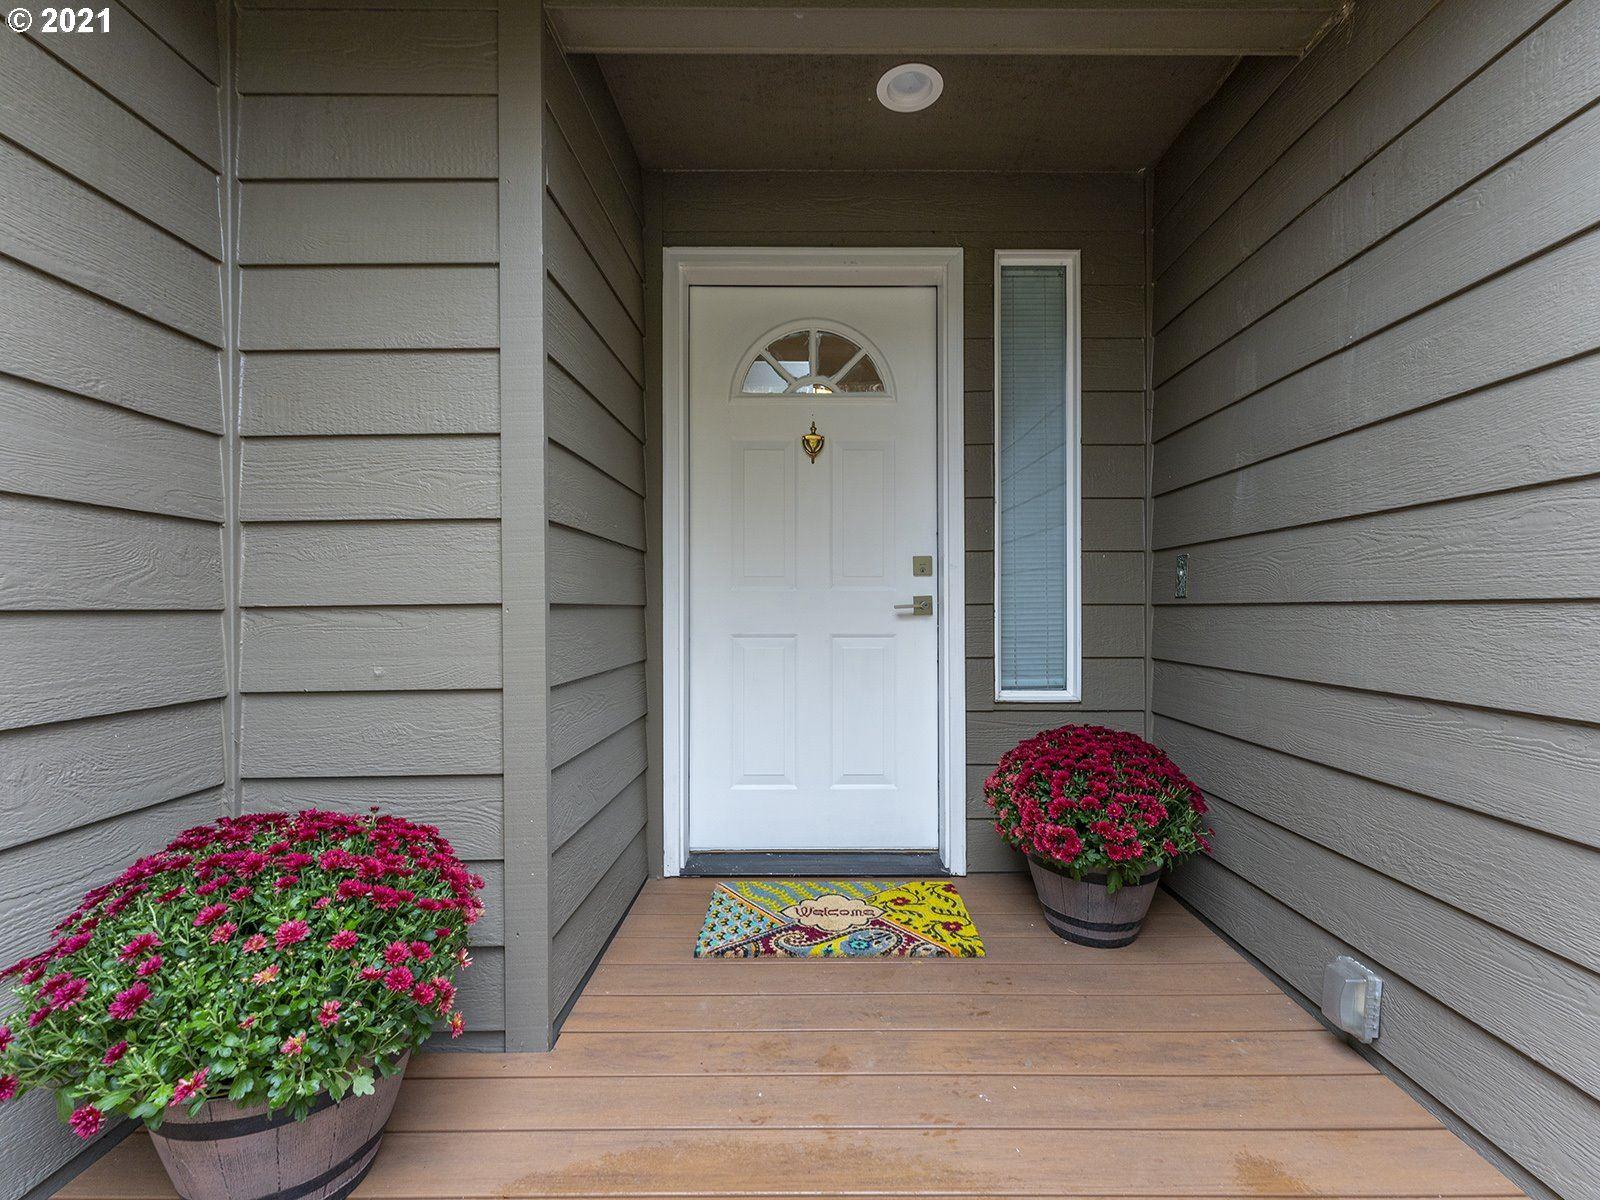 Photo of 17572 SW OVIATT ST, Beaverton, OR 97007 (MLS # 21023726)